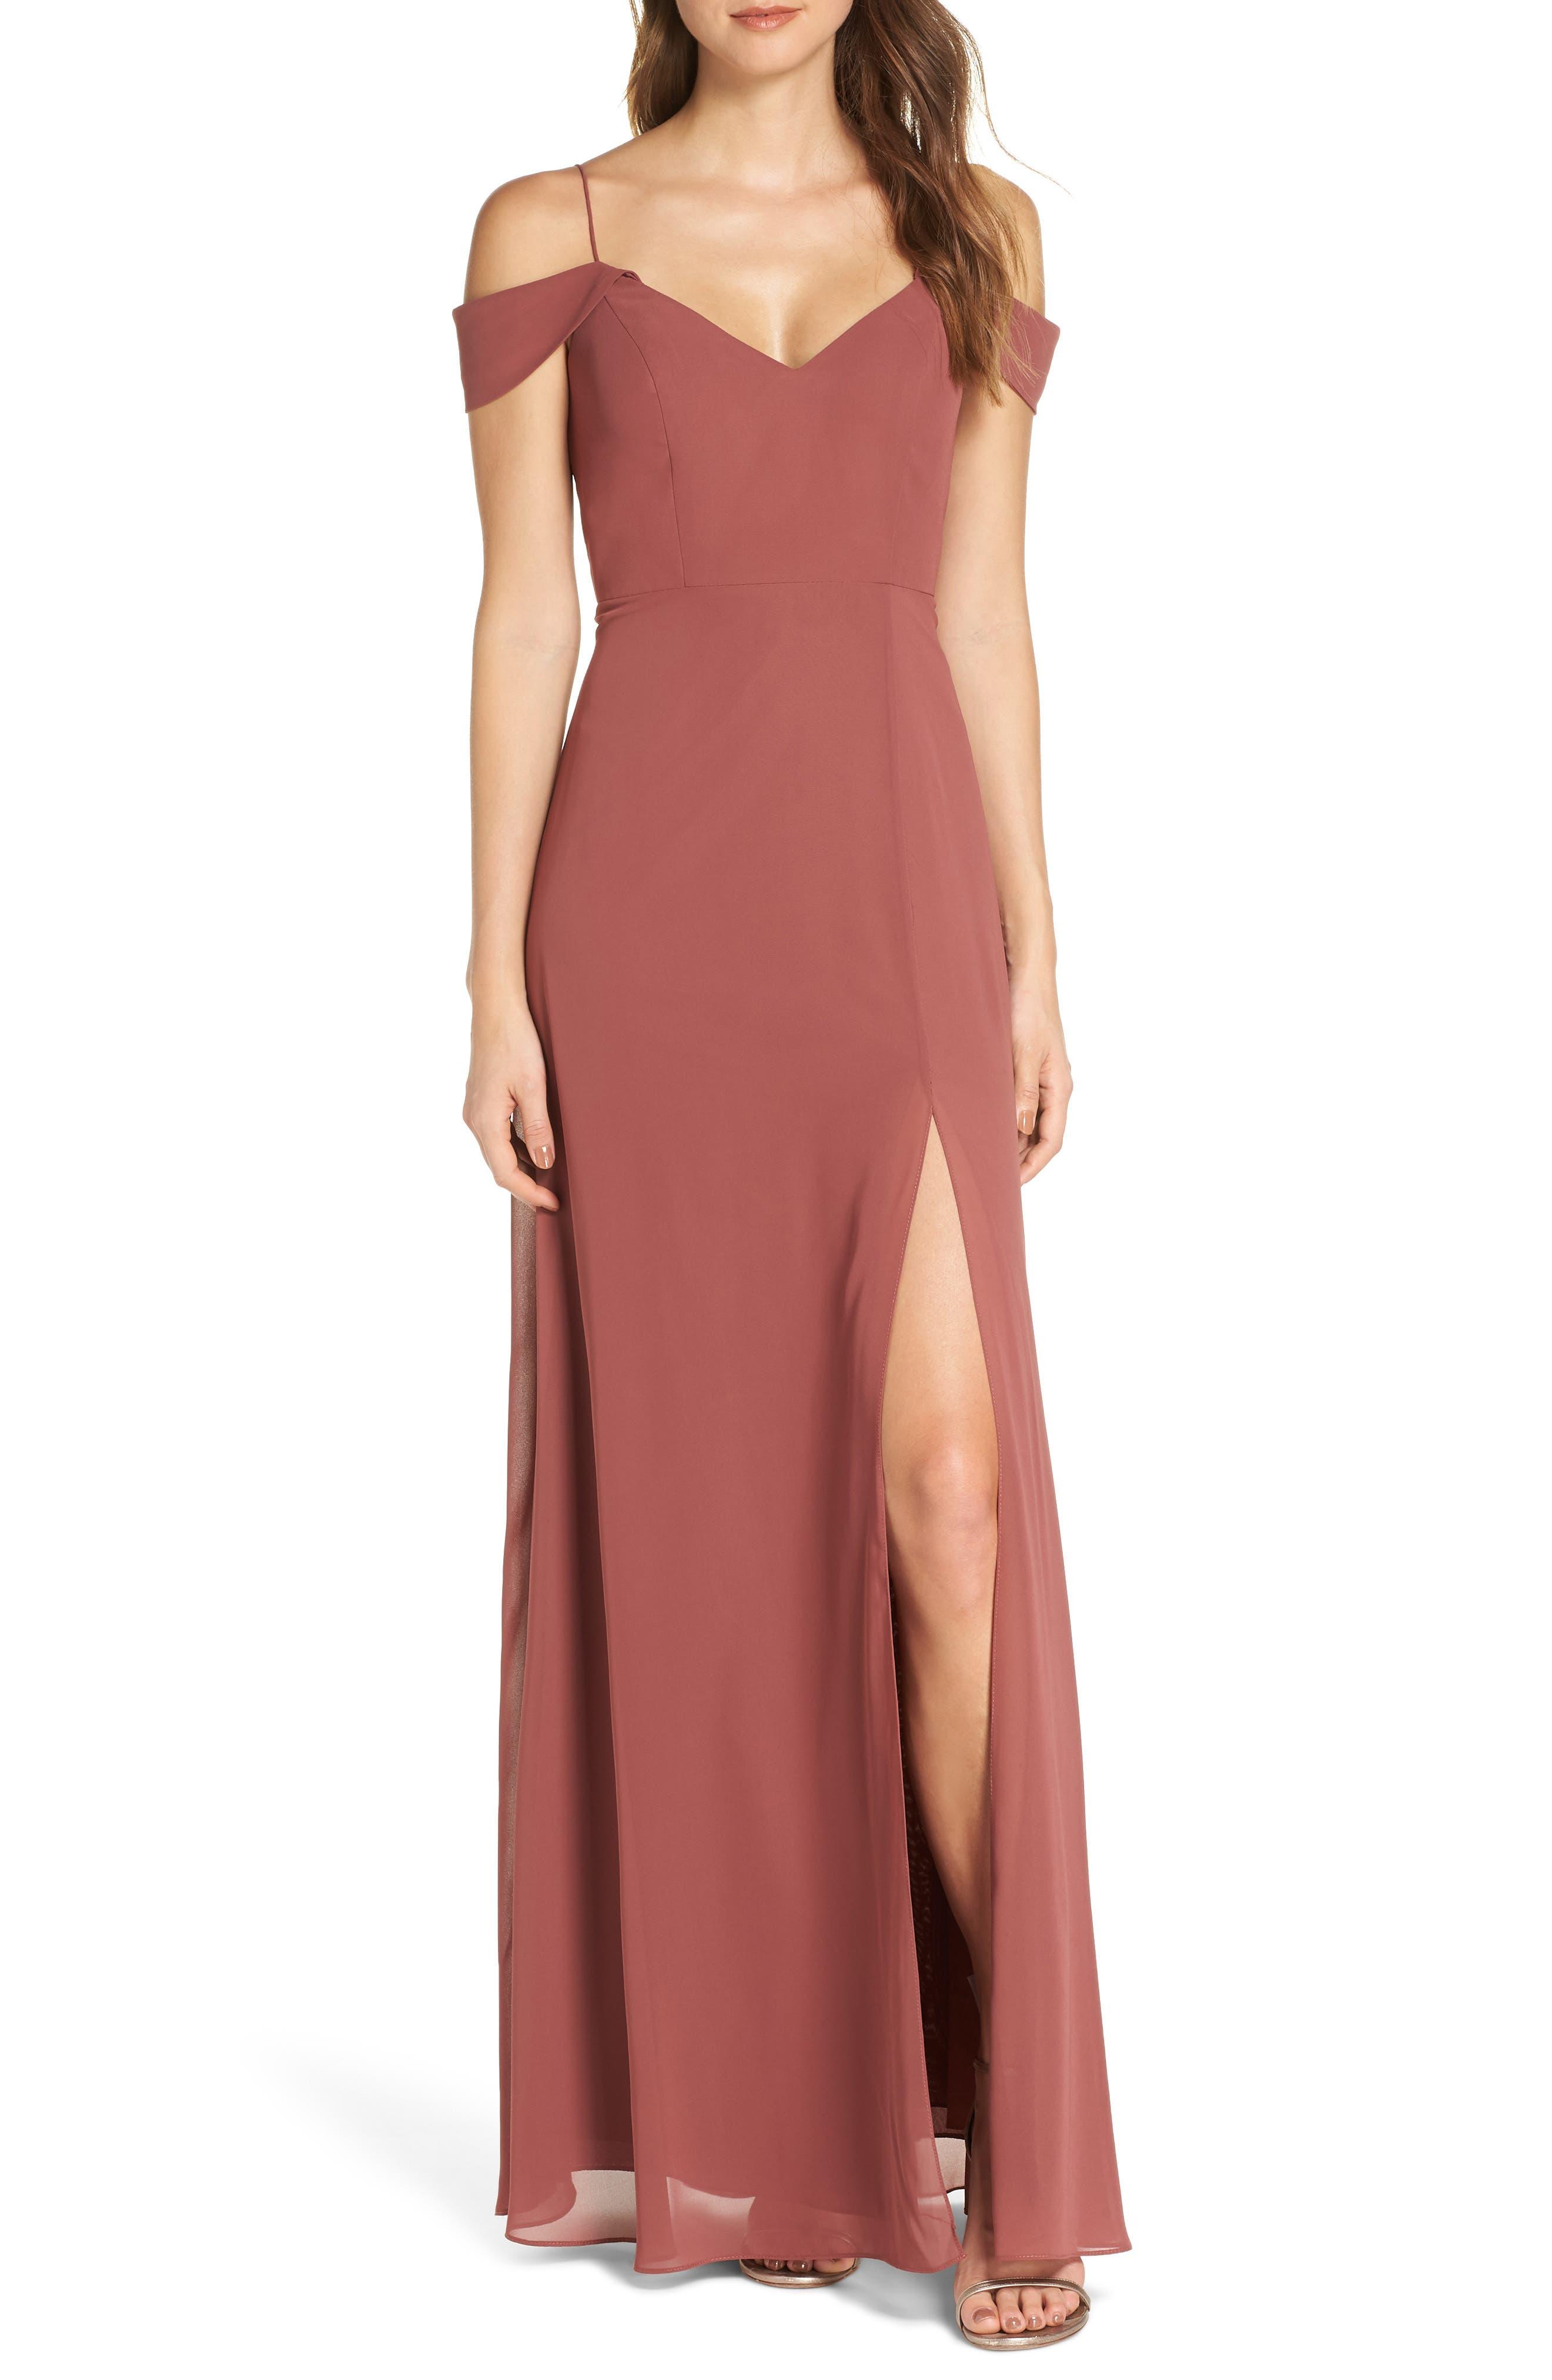 077a646199 Jenny Yoo Priya Cold Shoulder Chiffon Evening Dress